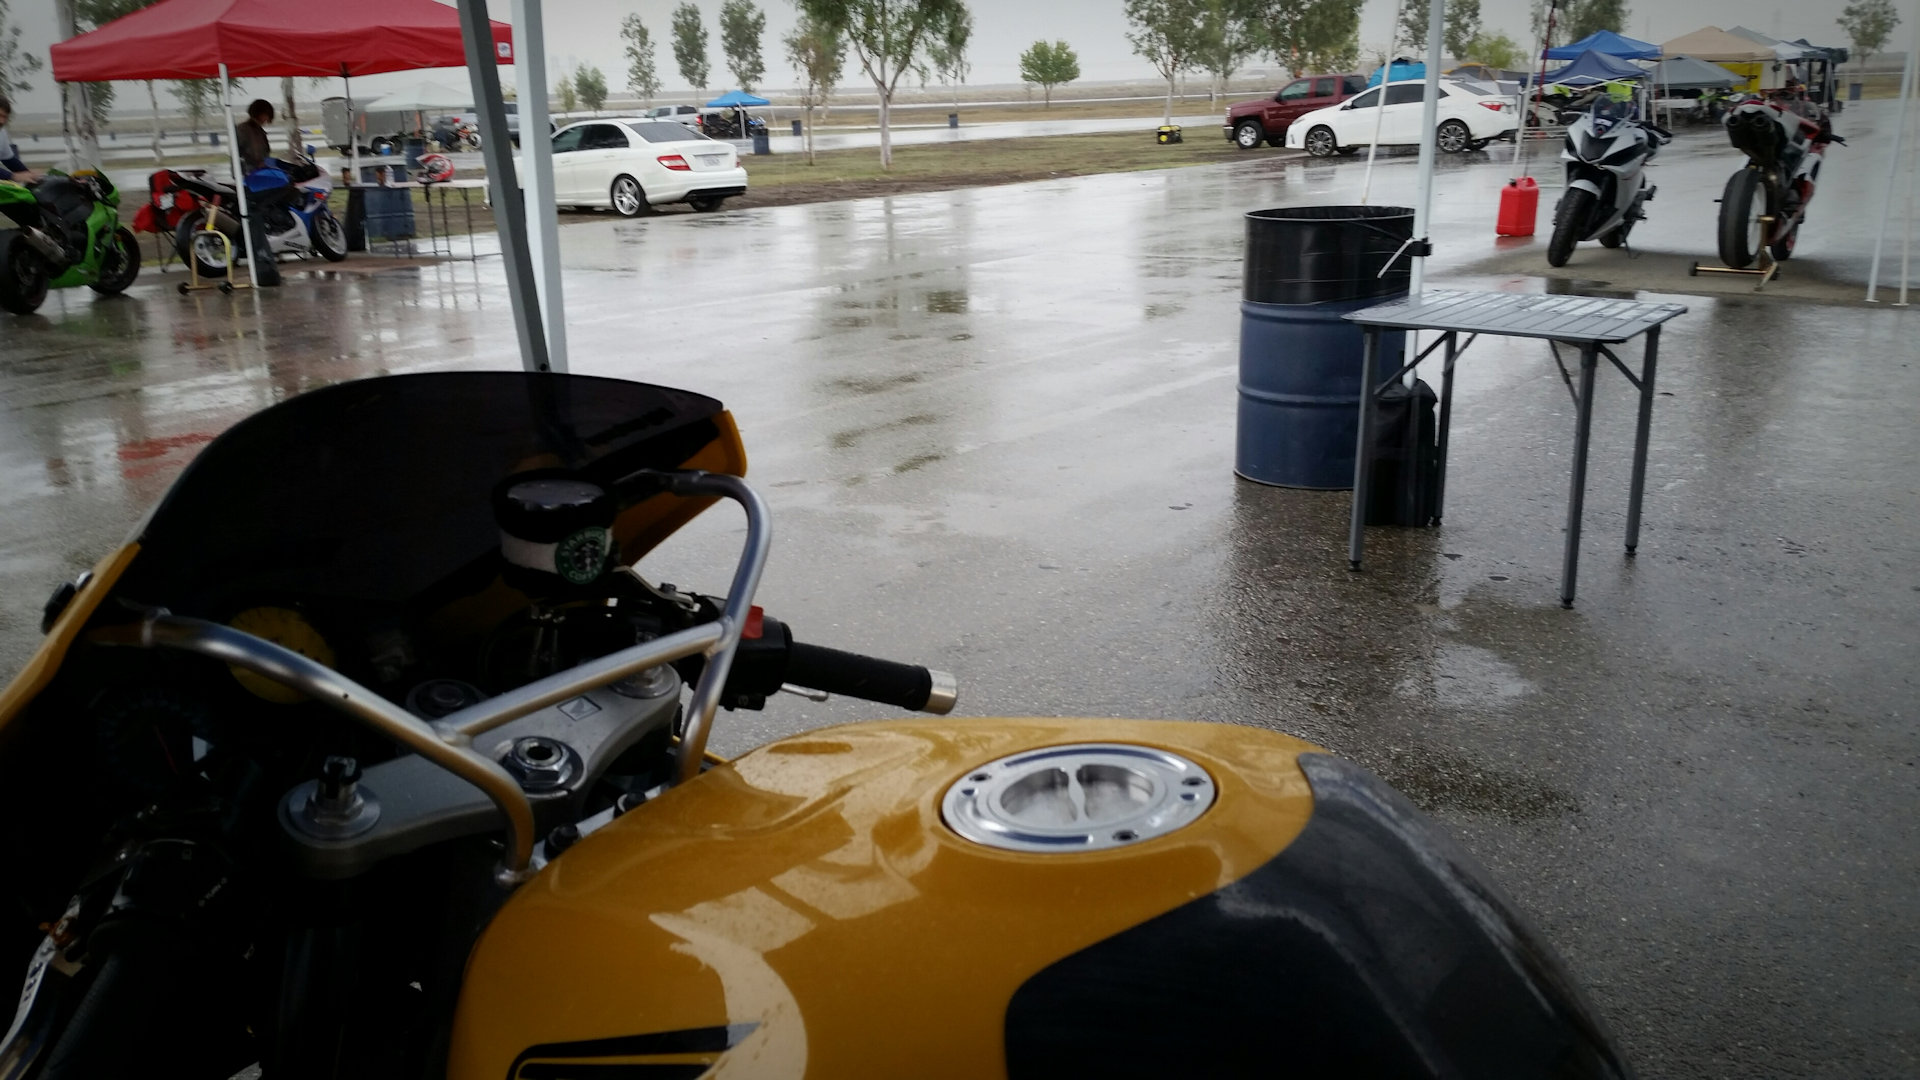 Rain, rain, go away, please don't ruin my track day